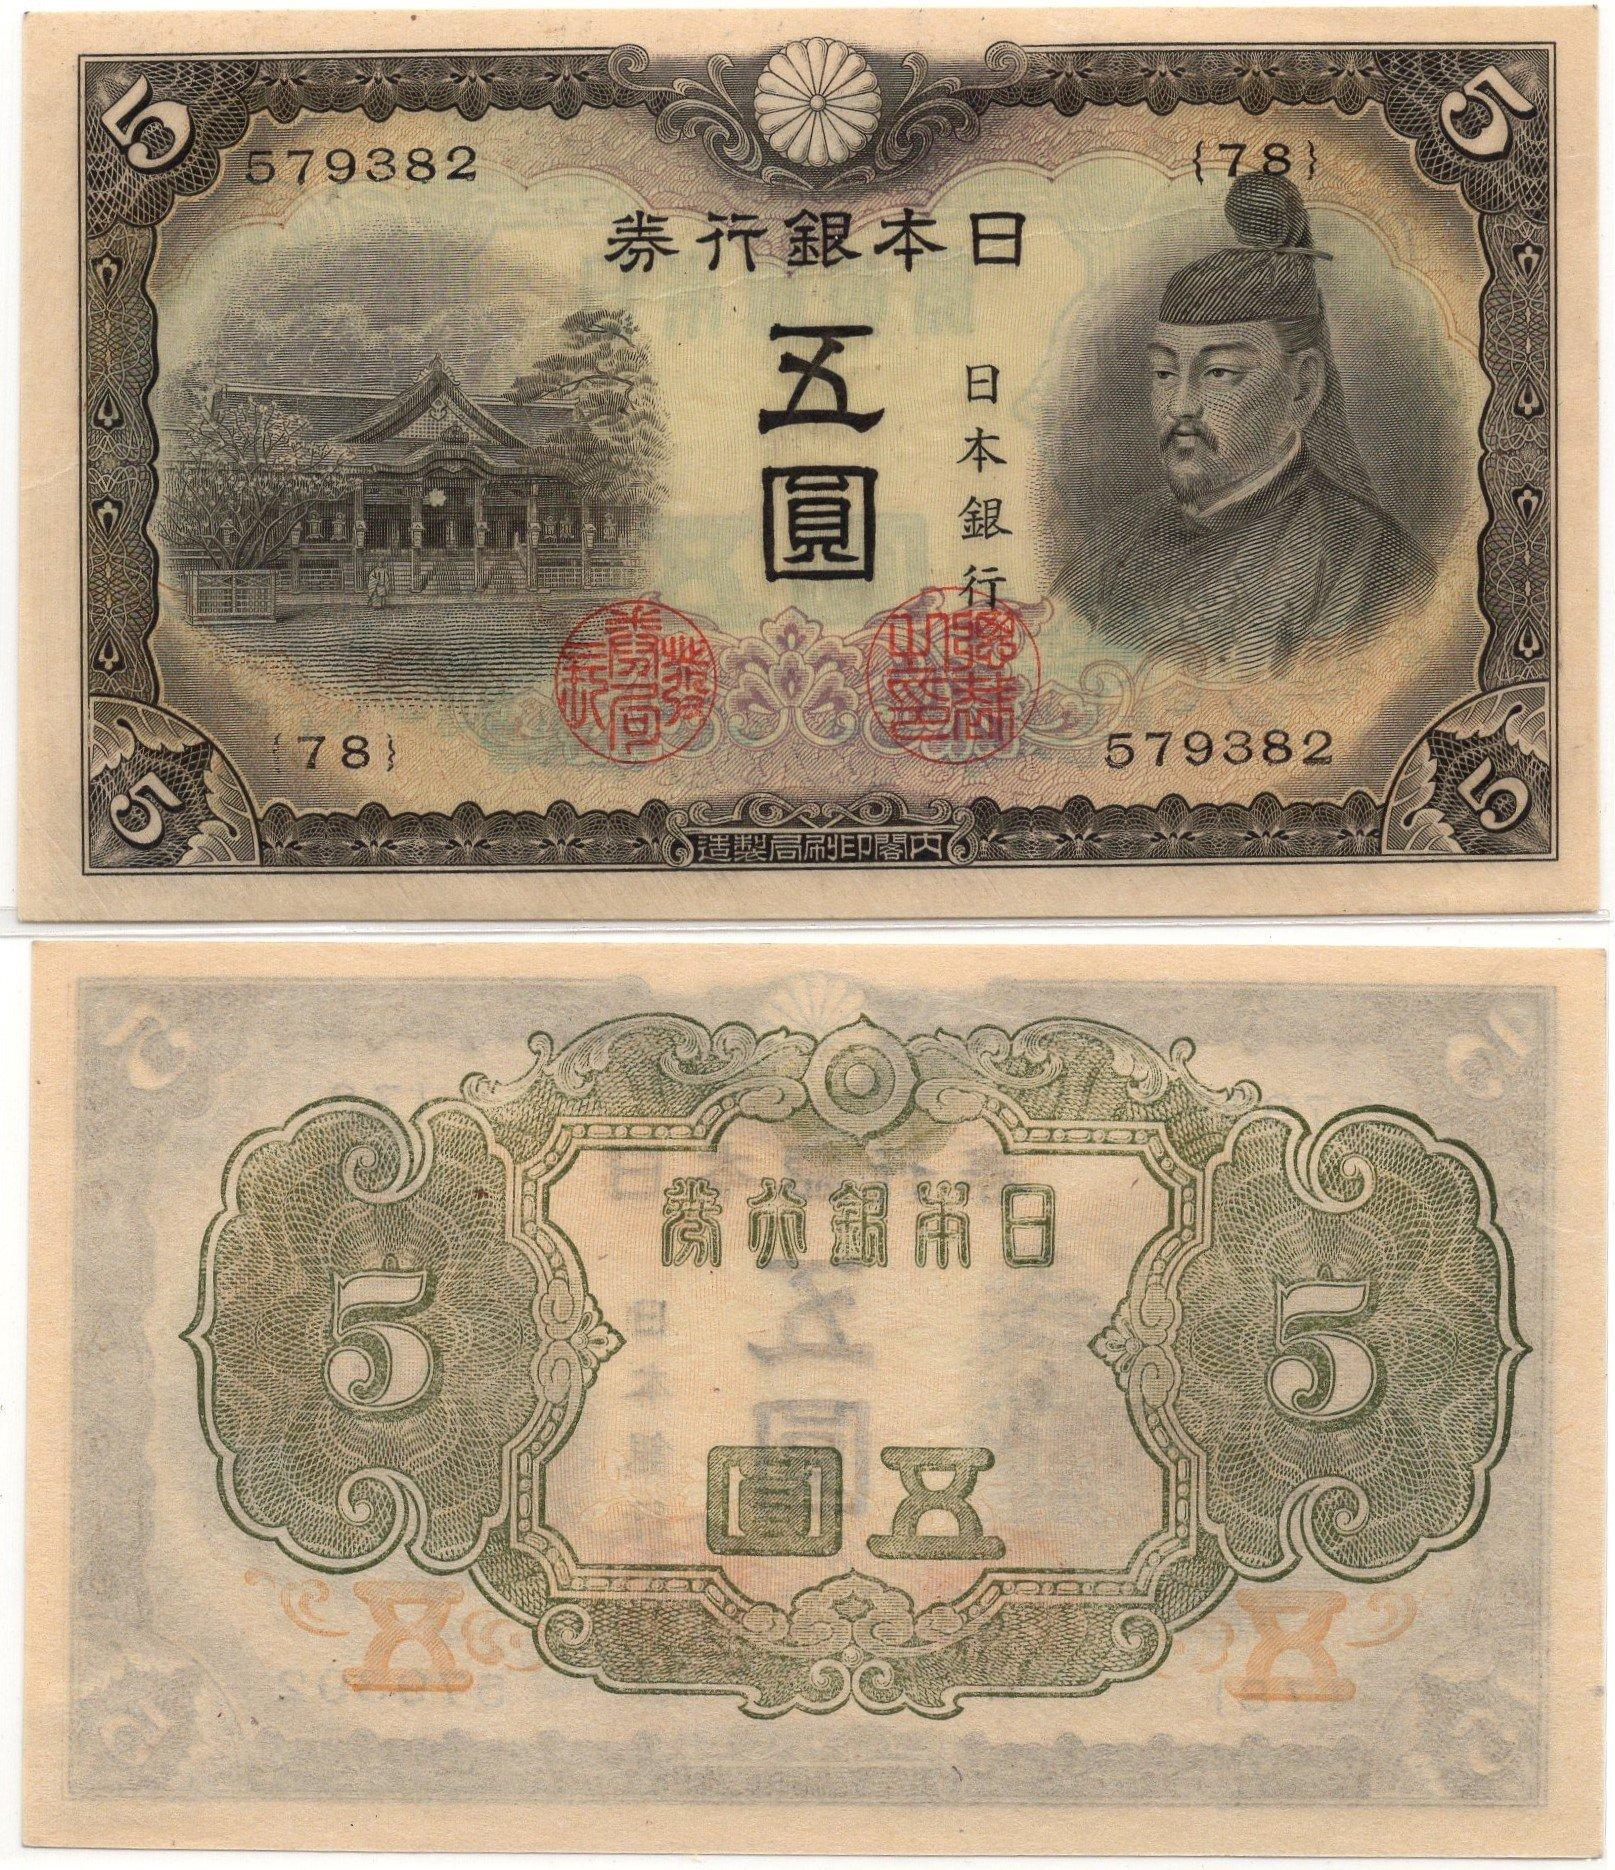 Japan 5 yen P55